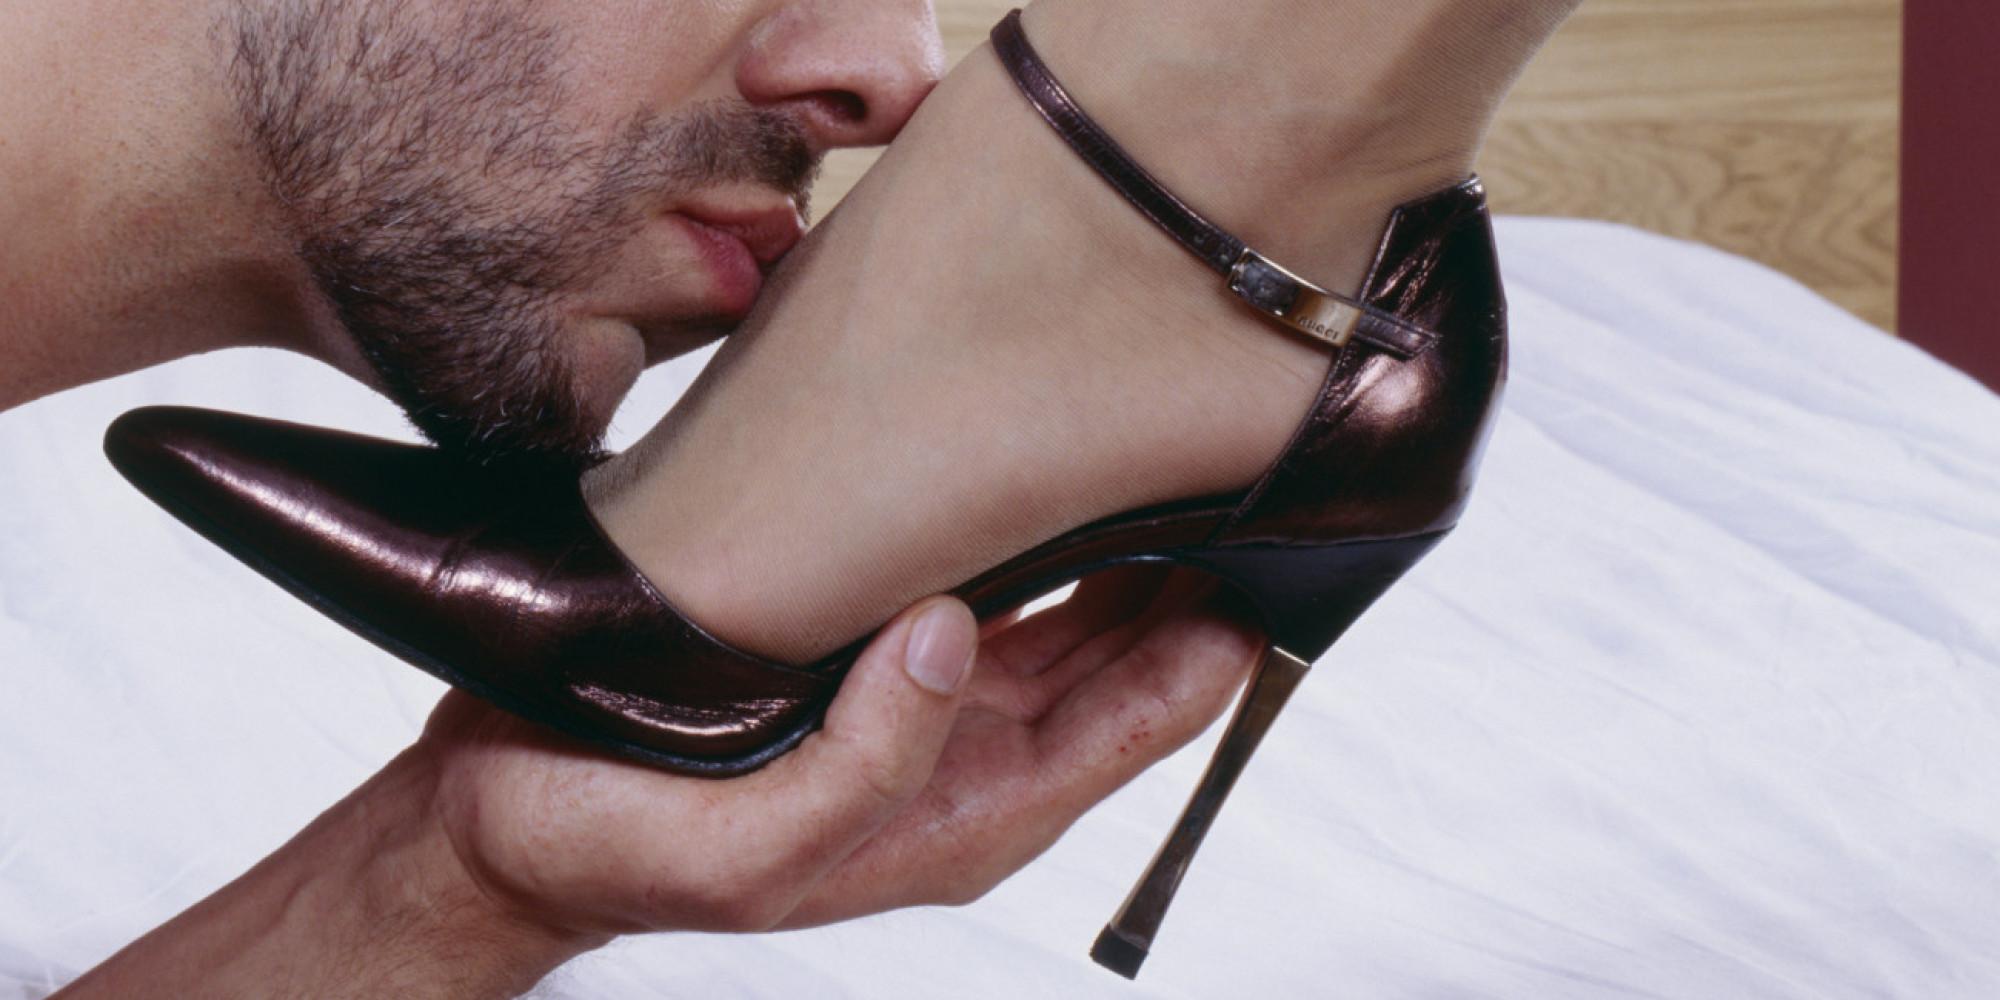 fetichismo de los pies 1 - El fetichismo de los pies